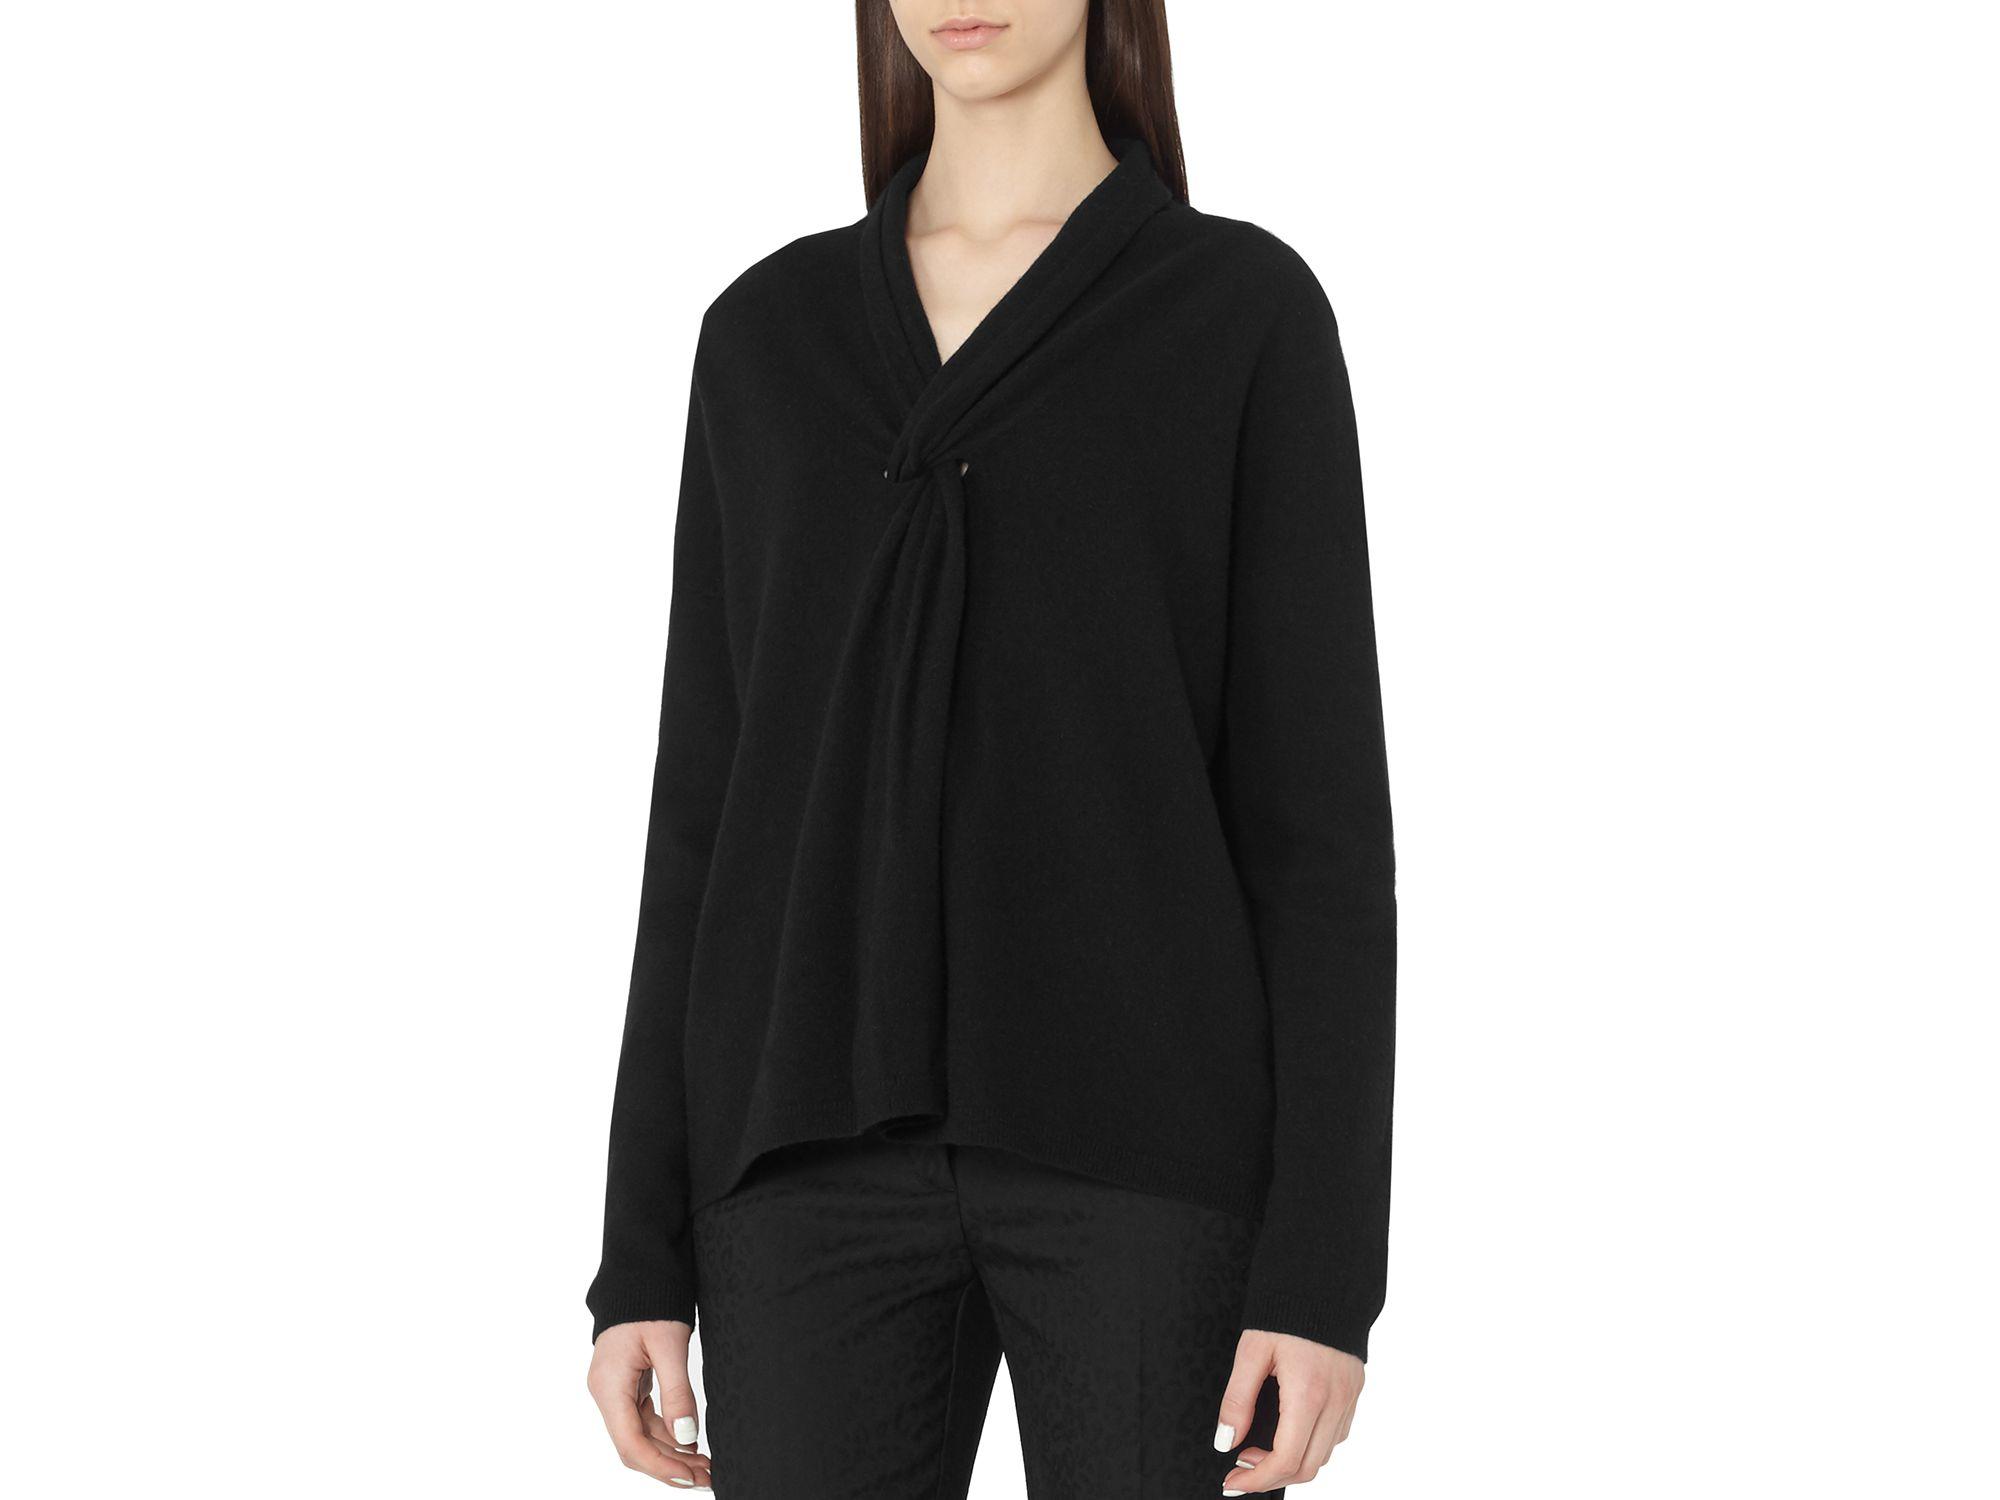 Reiss Sweater 91